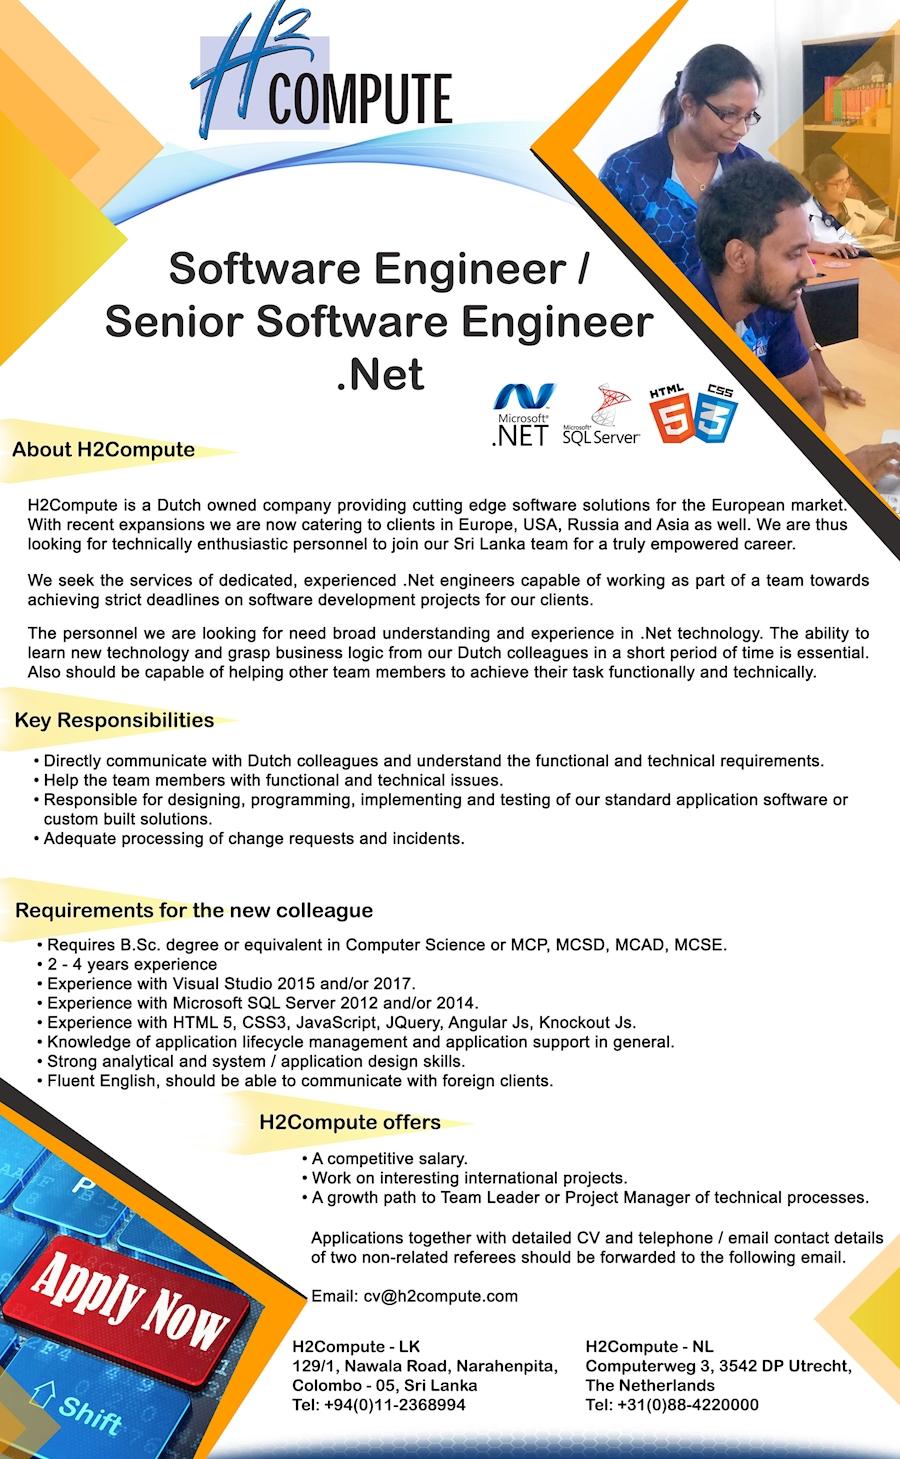 Software Engineer / Senior Software Engineer  Net at H2Compute